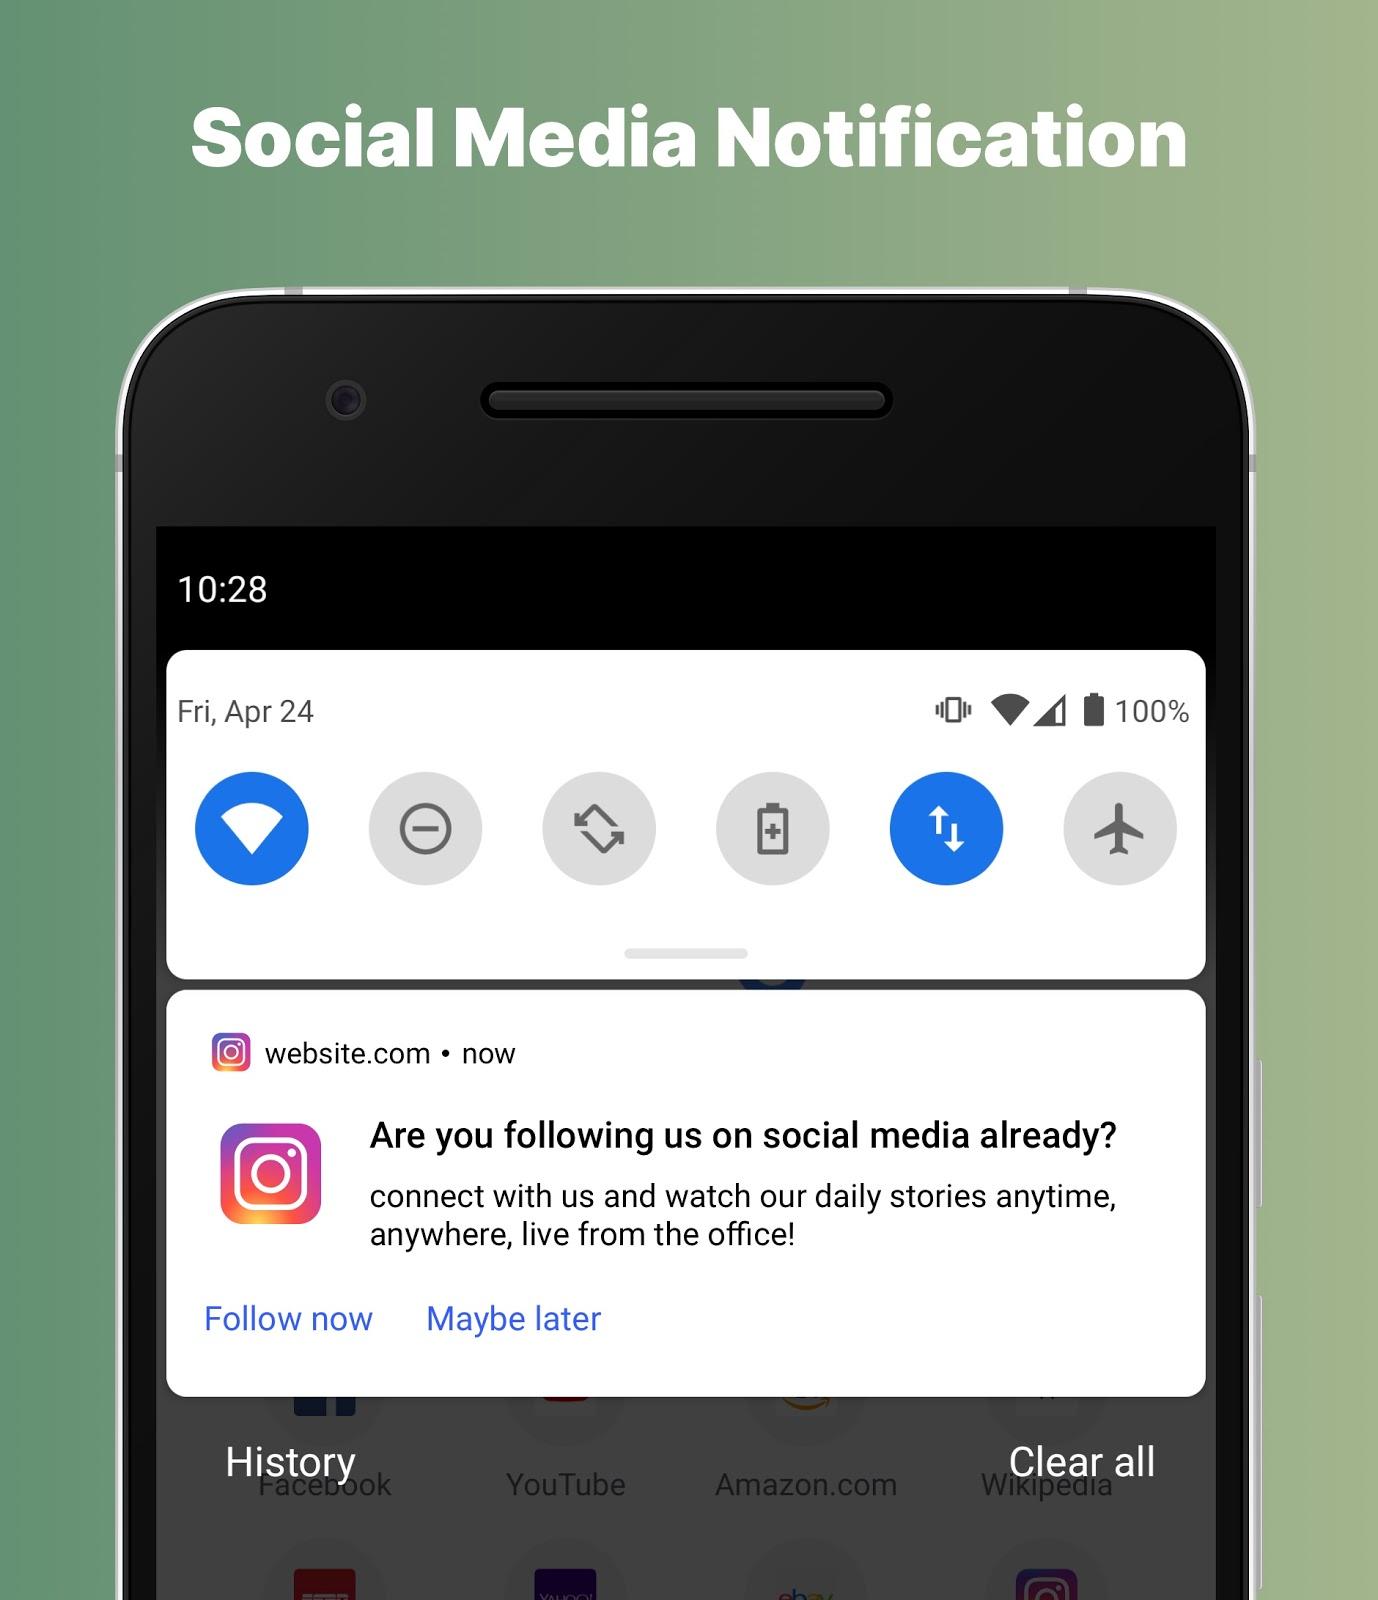 Example of a social media push notification